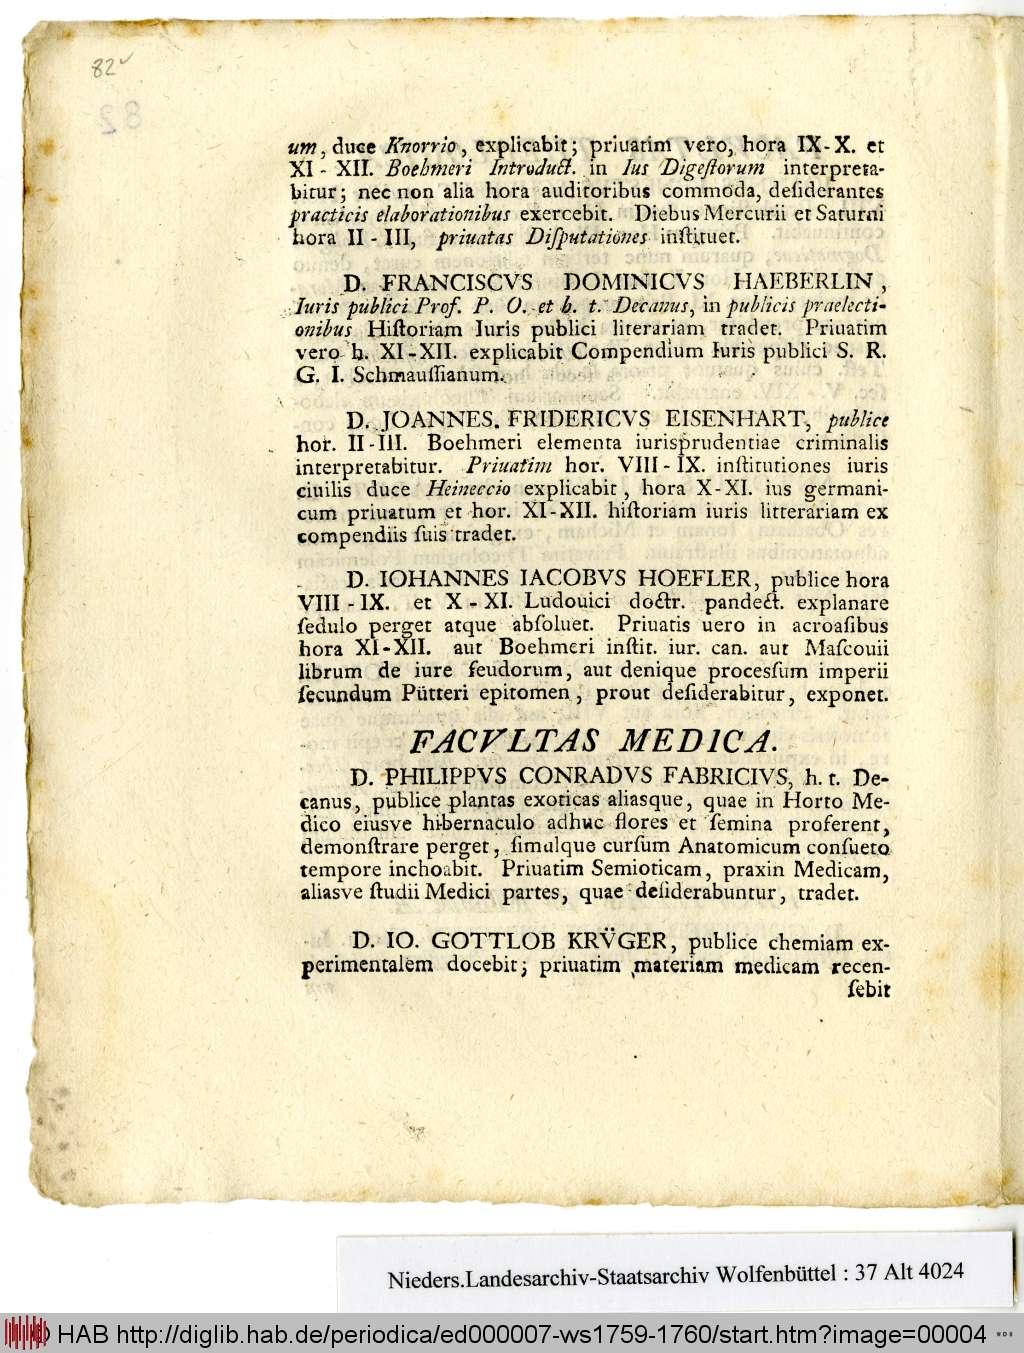 https://diglib.hab.de/periodica/ed000007-ws1759-1760/00004.jpg